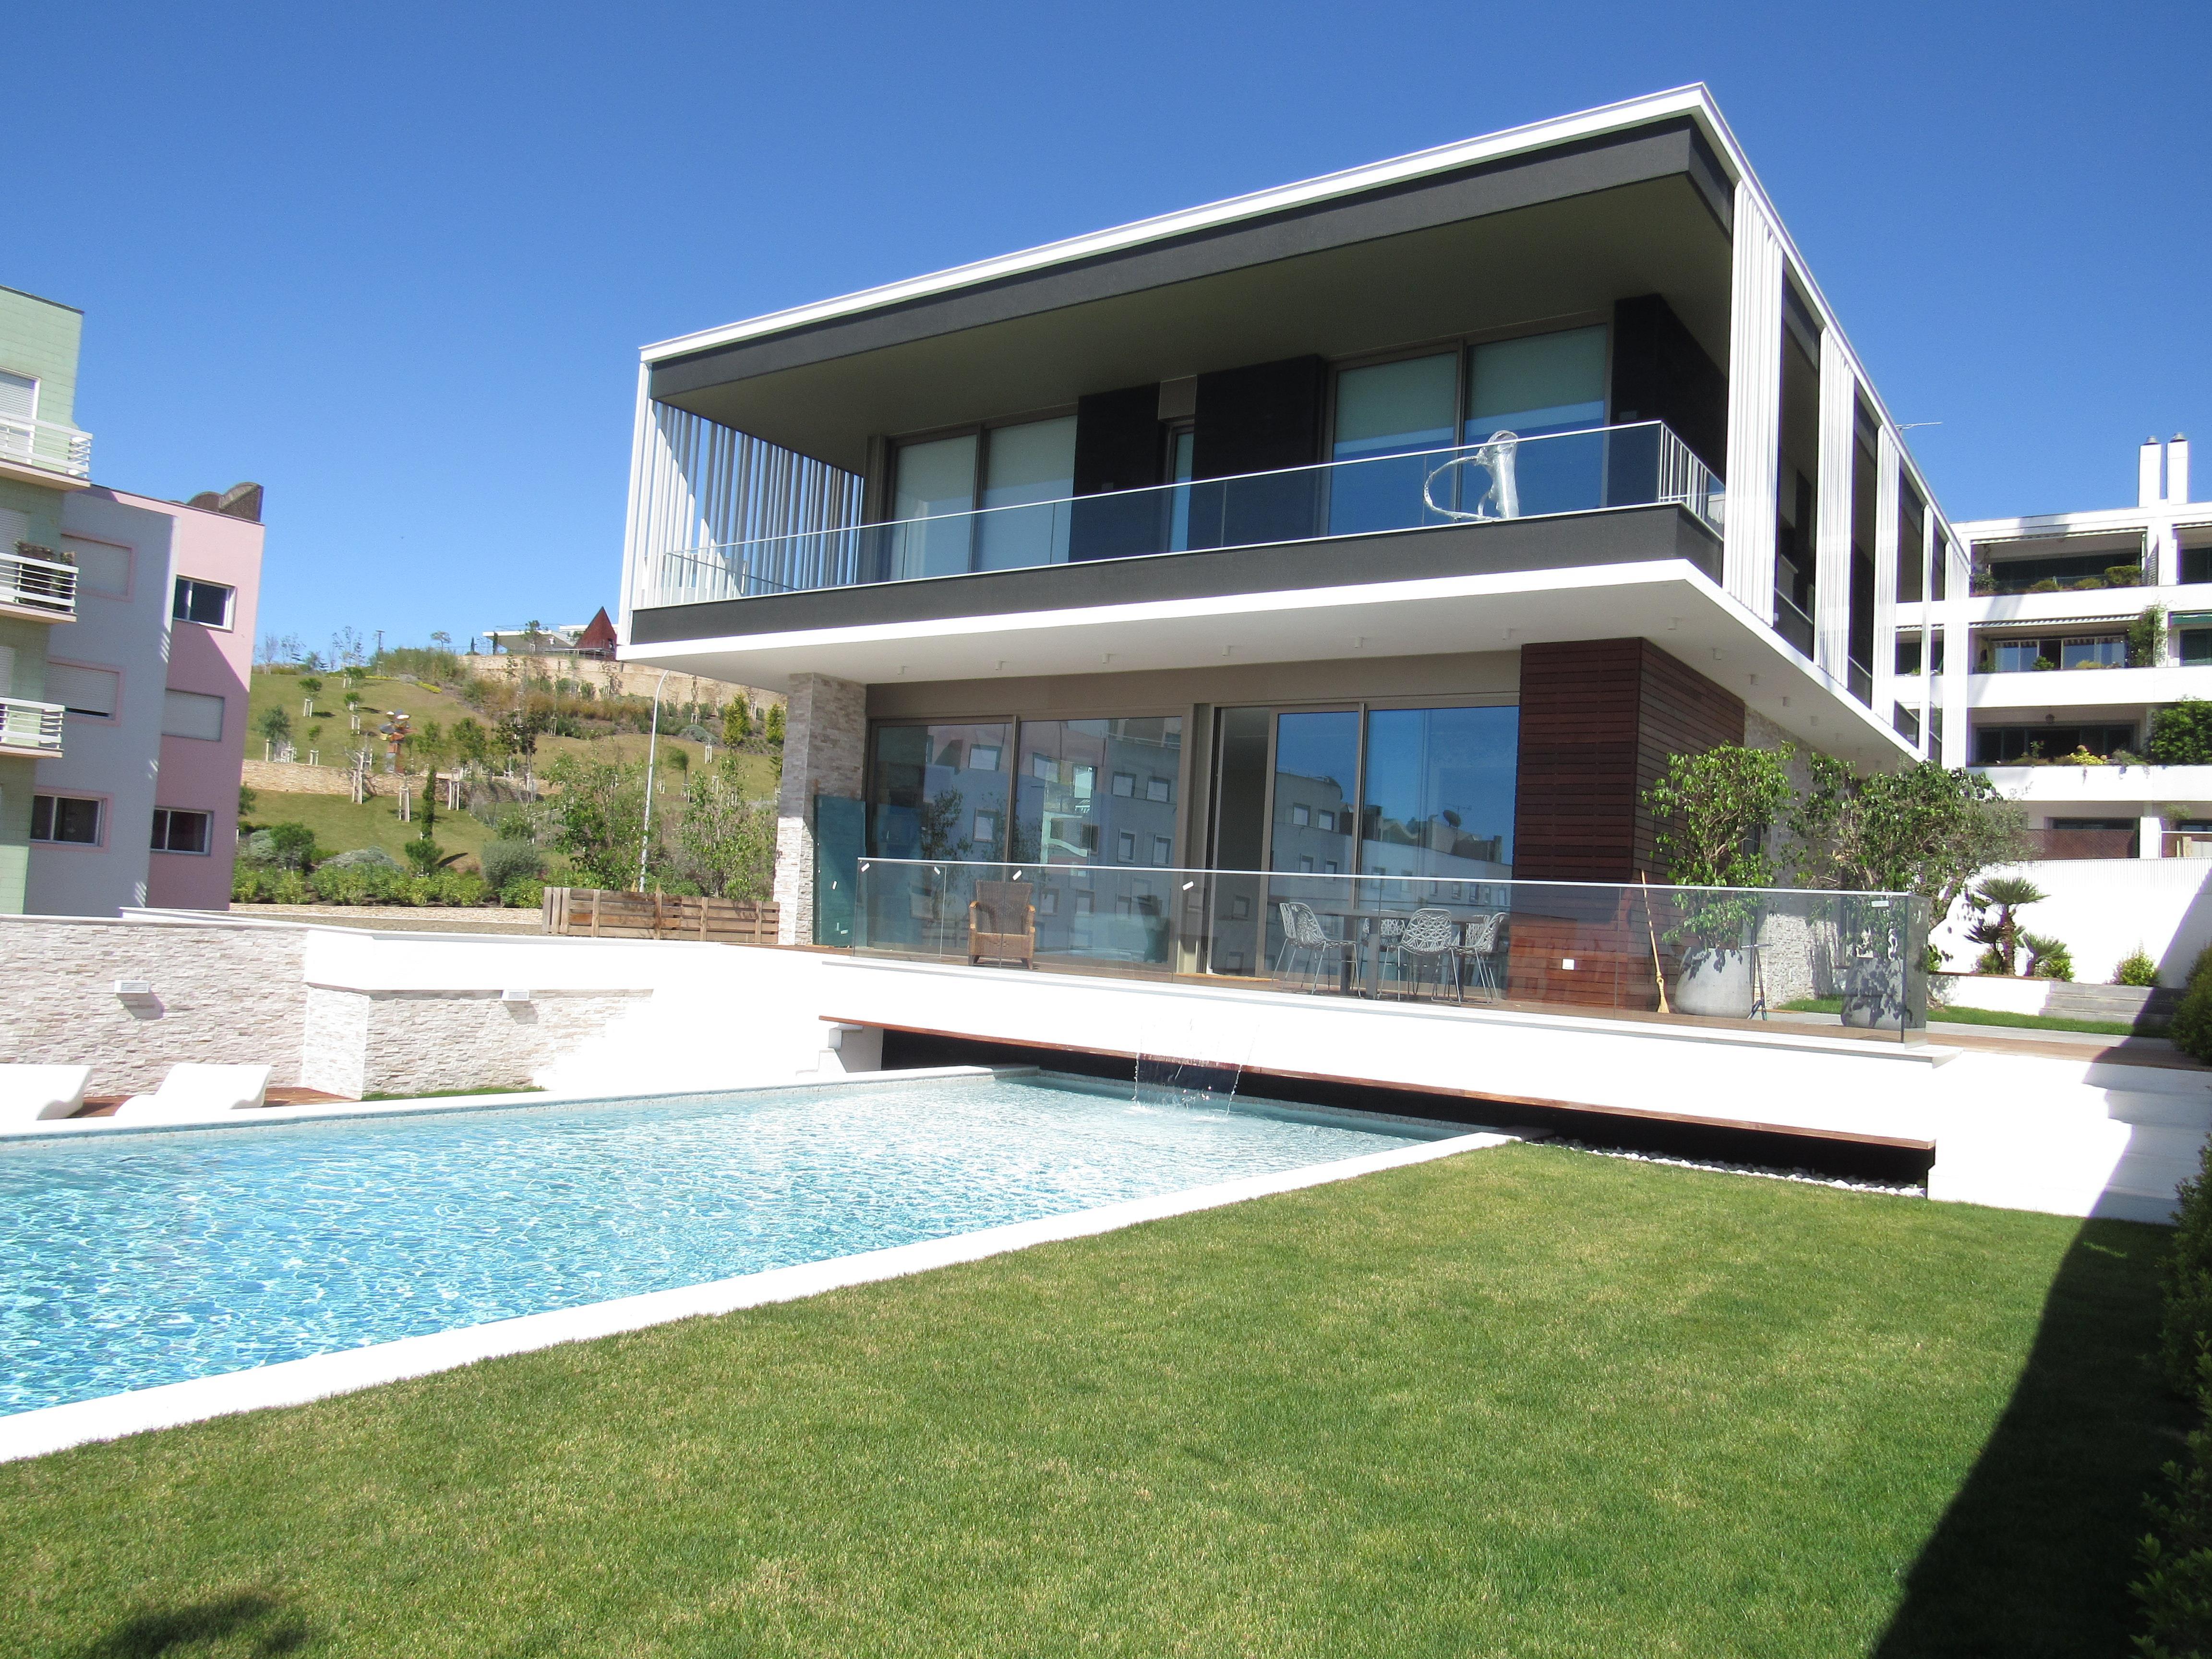 獨棟家庭住宅 為 出售 在 Detached house, 4 bedrooms, for Sale Oeiras, 葡京 2780-171 葡萄牙